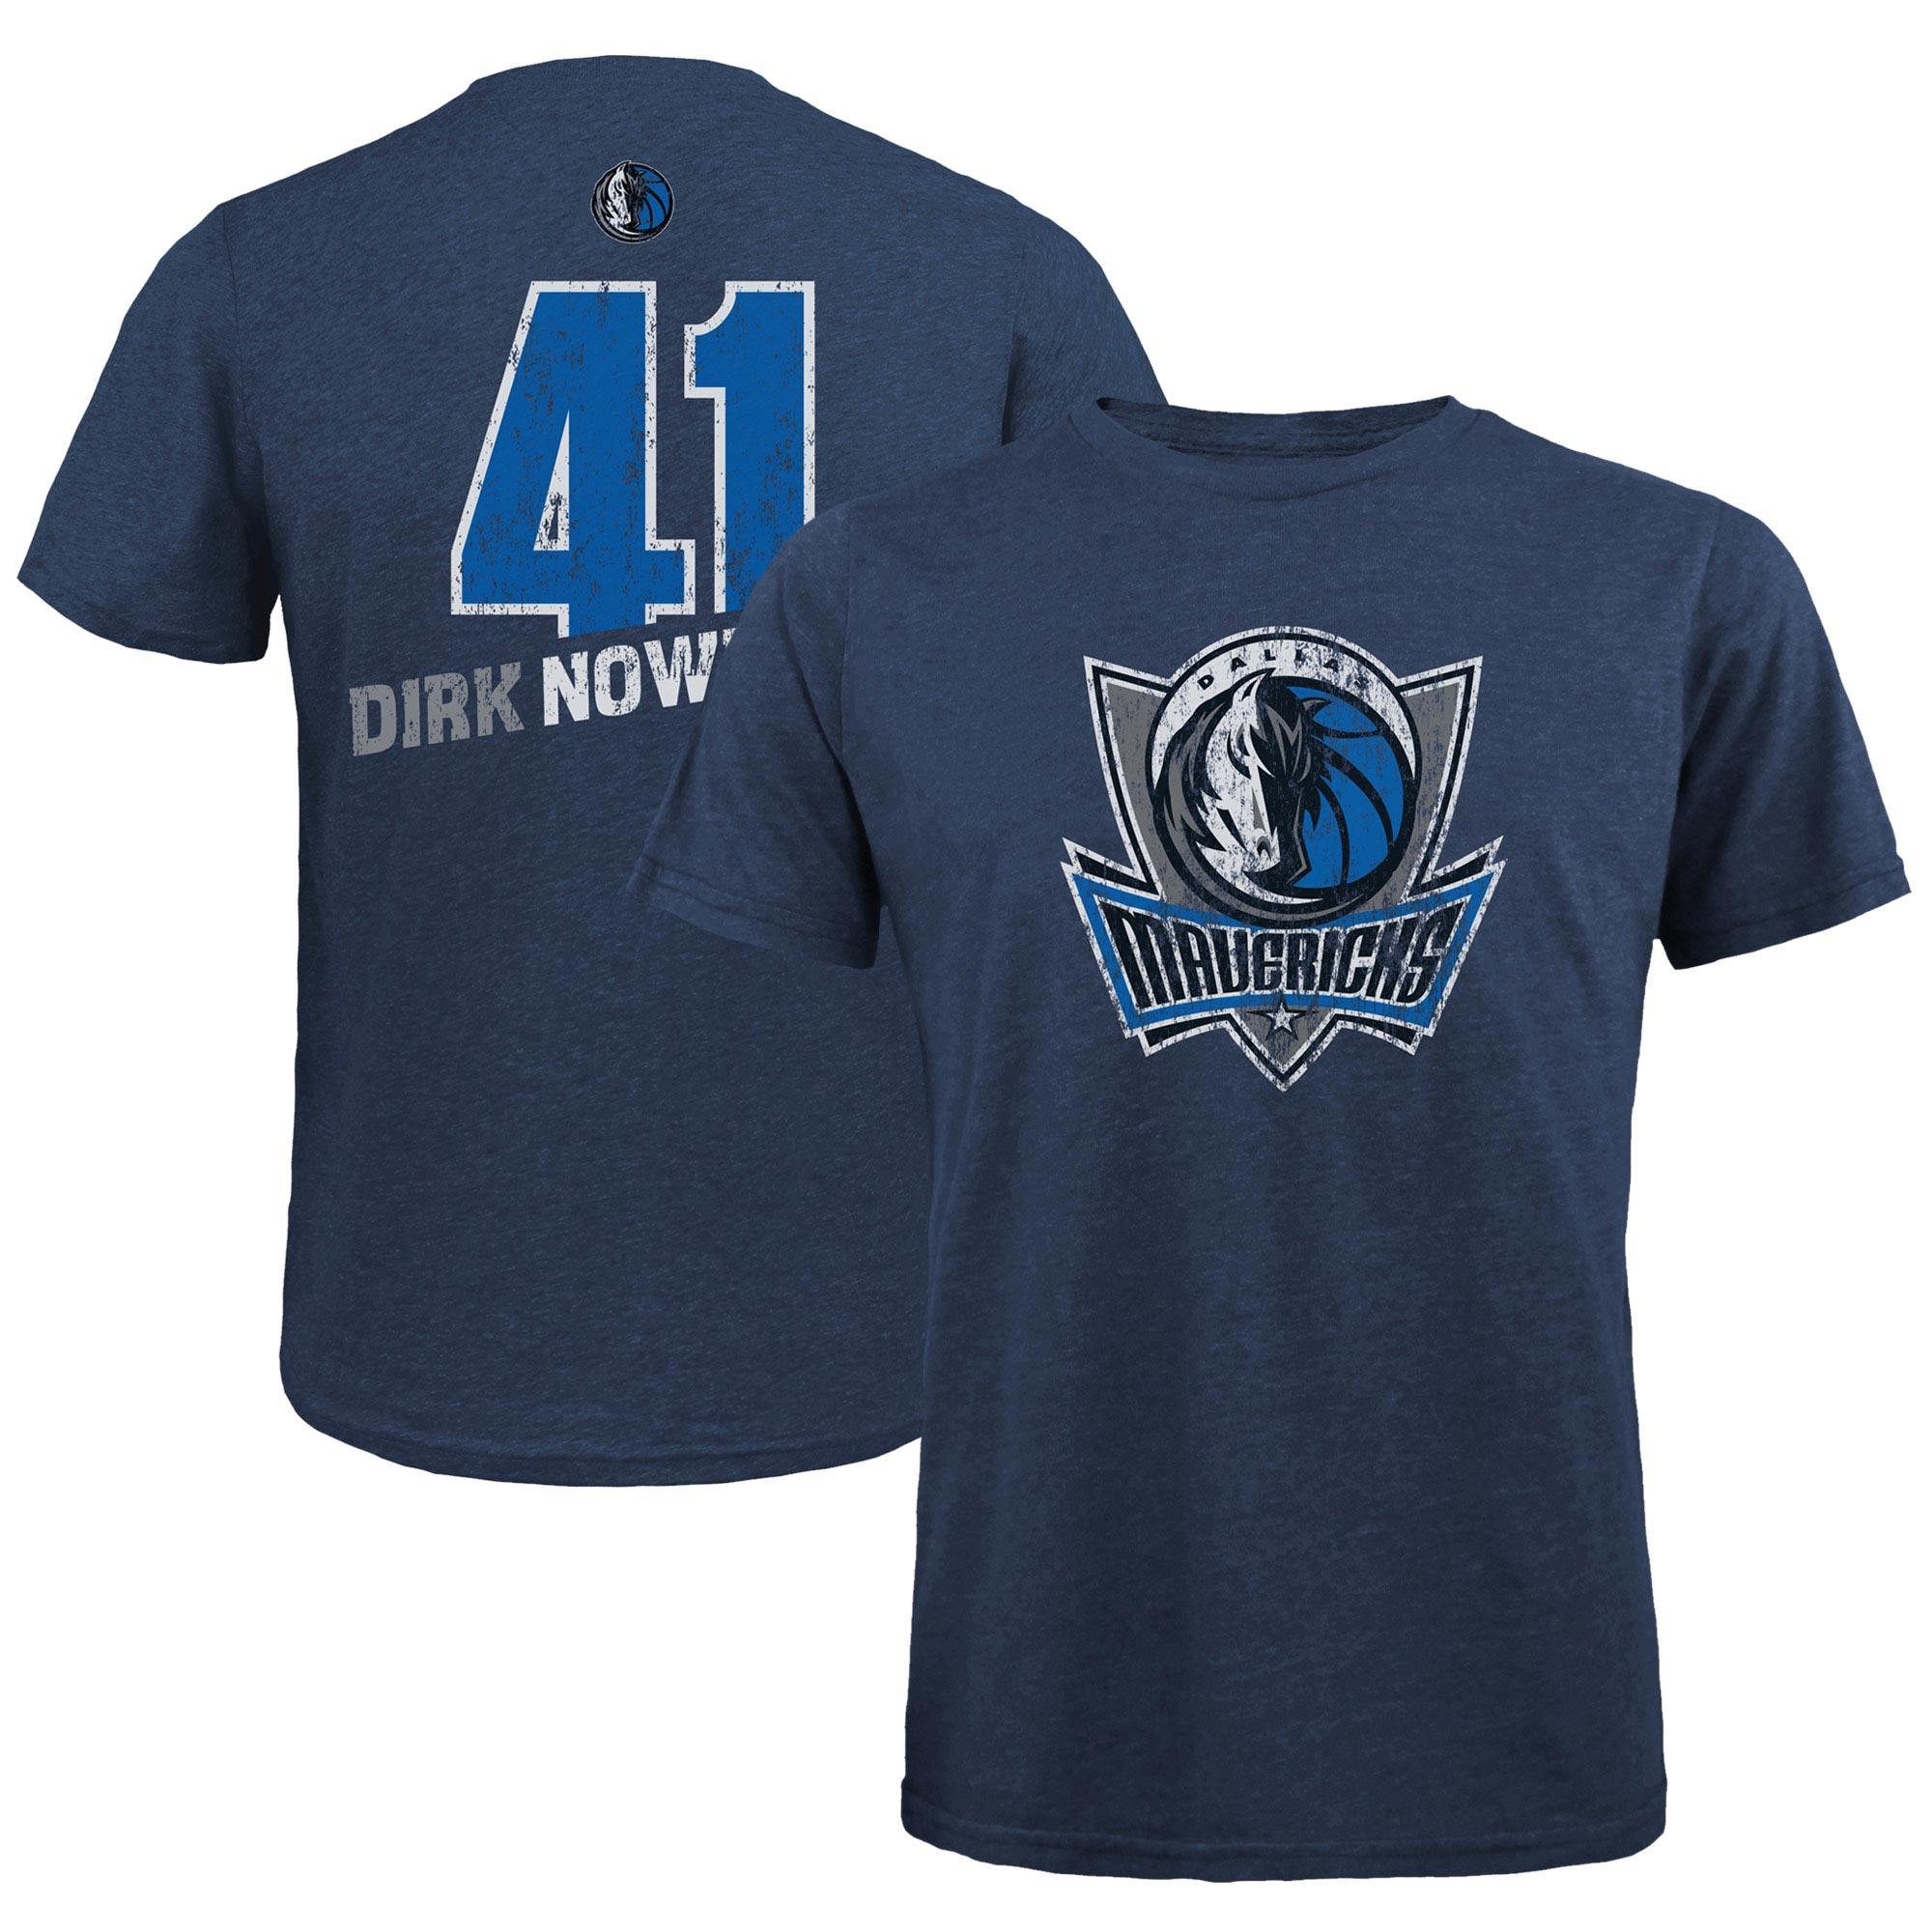 Dirk Nowitzki Dallas Mavericks Majestic Threads Name & Number Tri-Blend T-Shirt - Navy